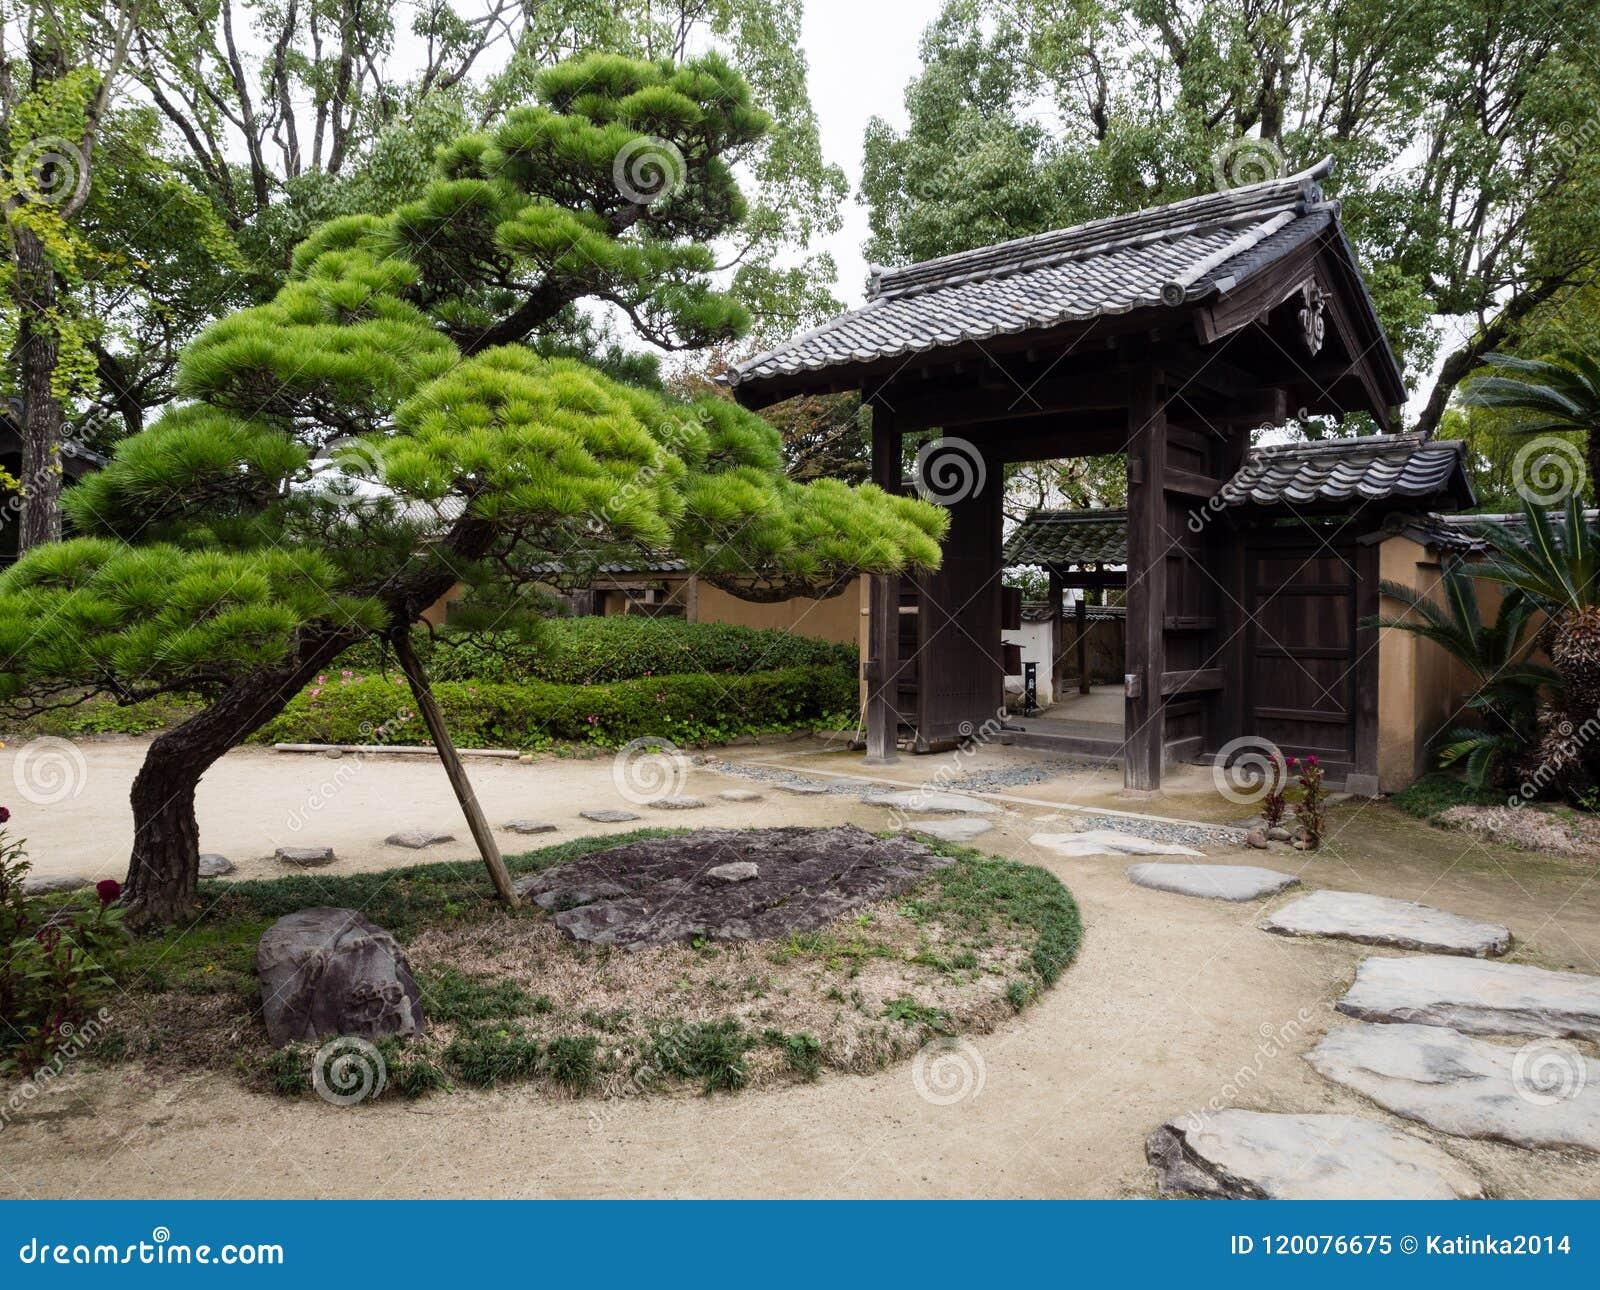 Kitsuki, Japan - October 31, 2016: Entrance to Nomi residence, a samurai house from Edo period